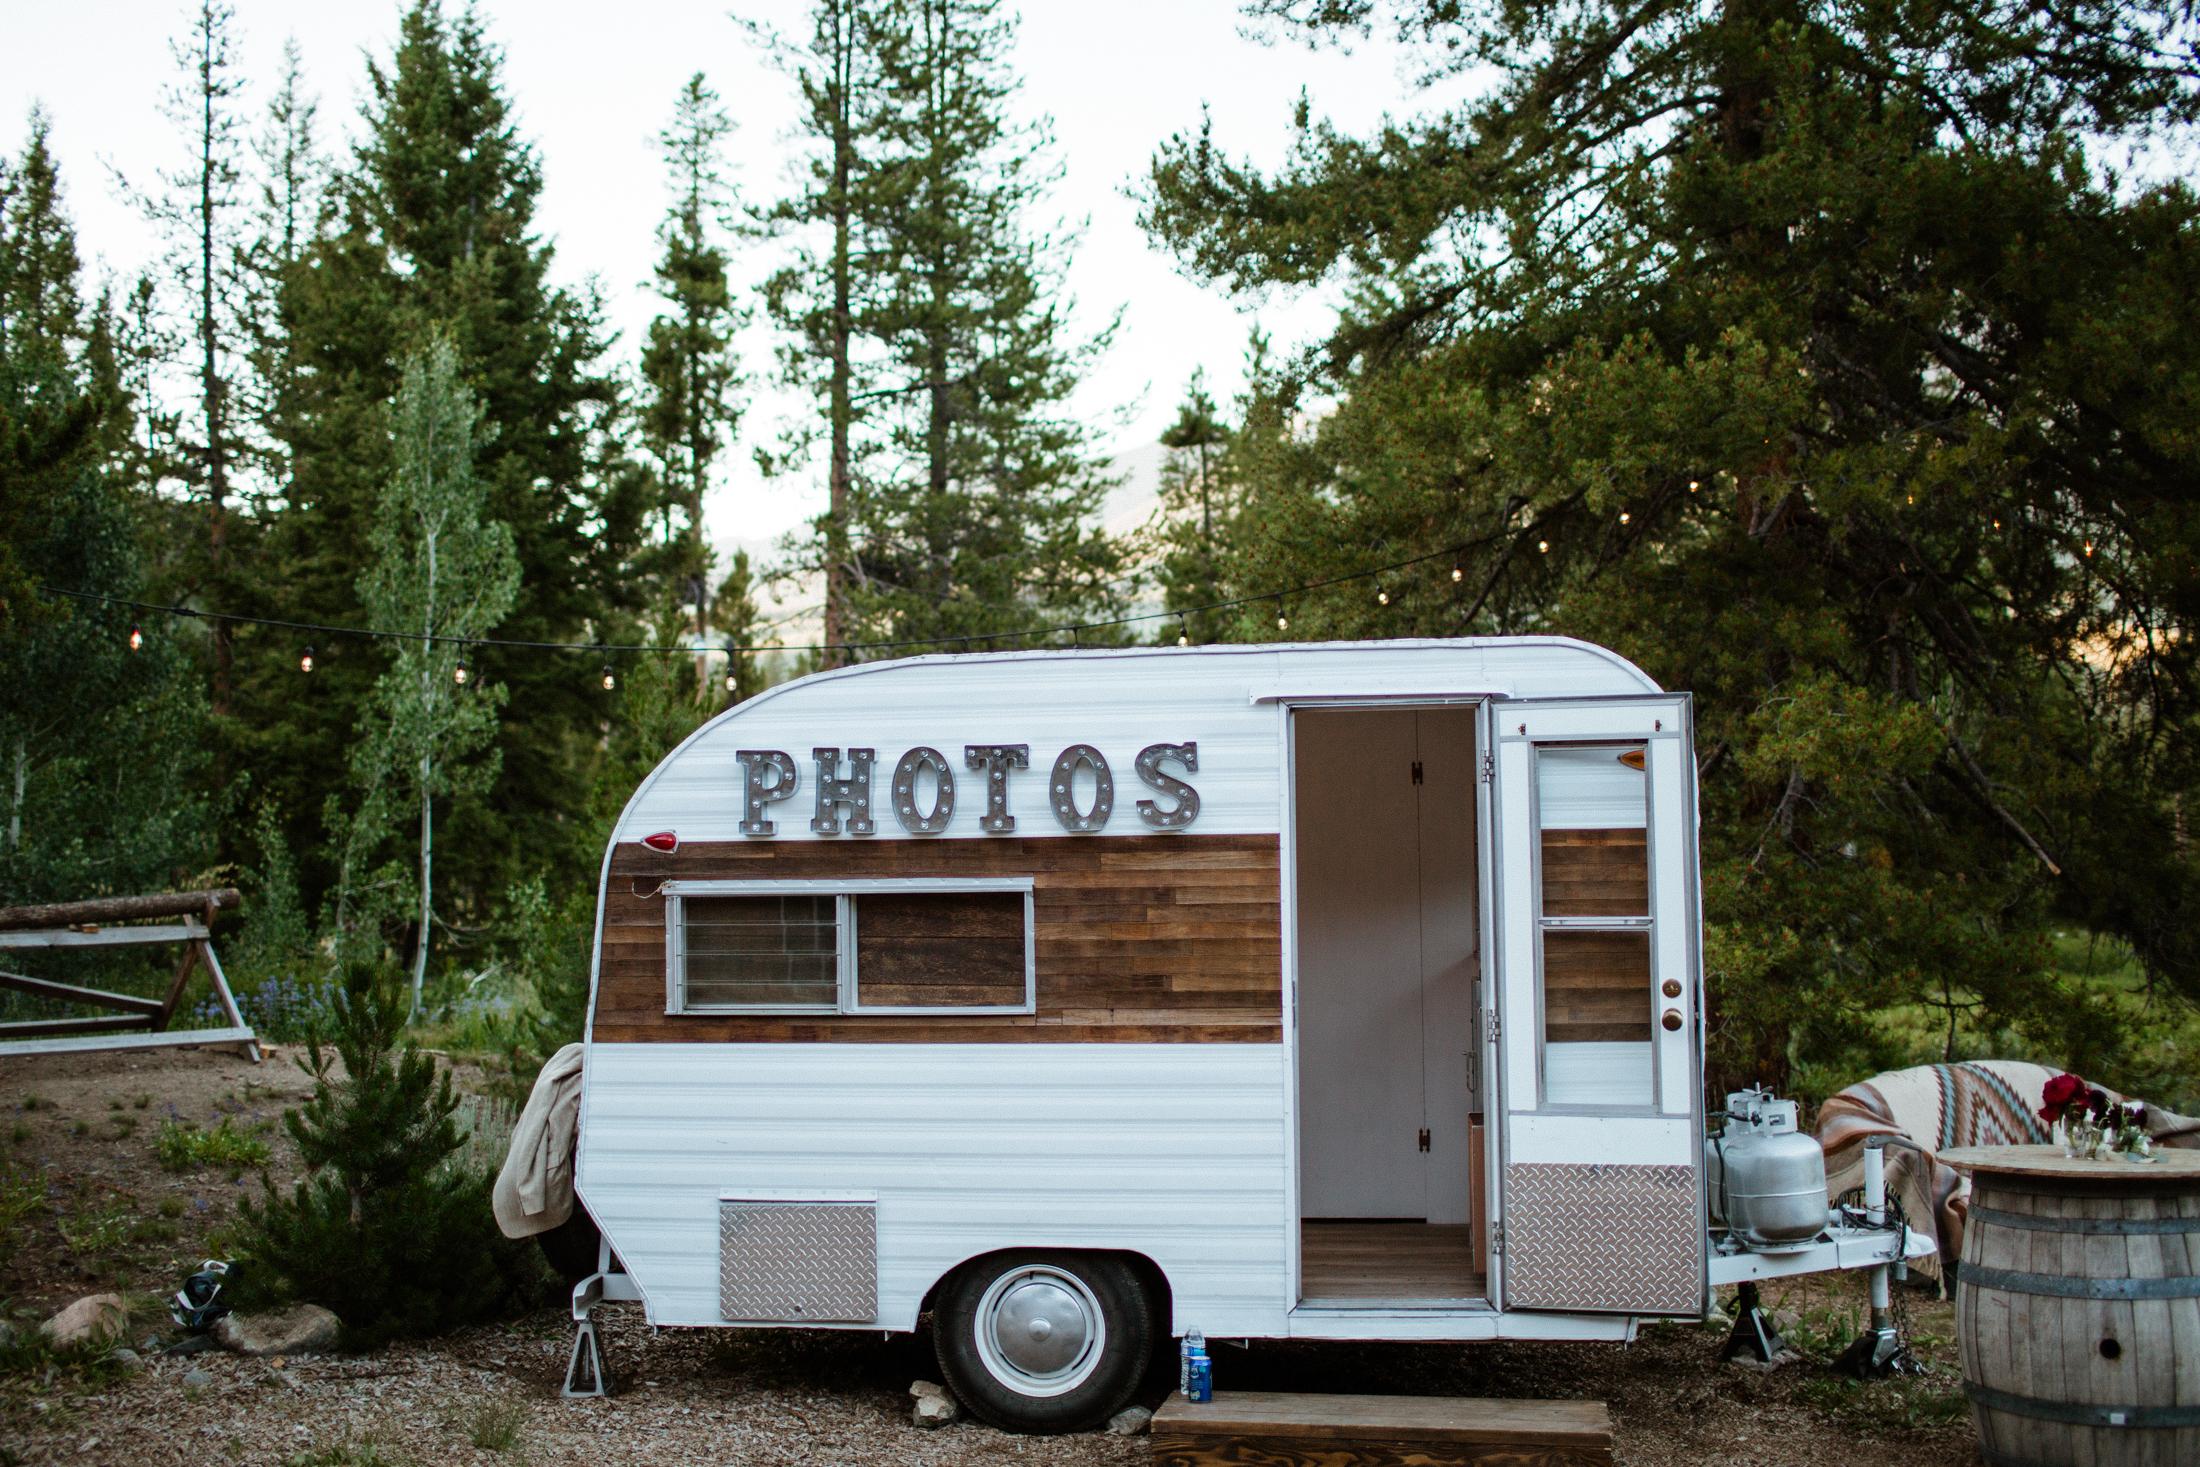 idaho-4h-camp-wedding-christinemarie-186.jpg